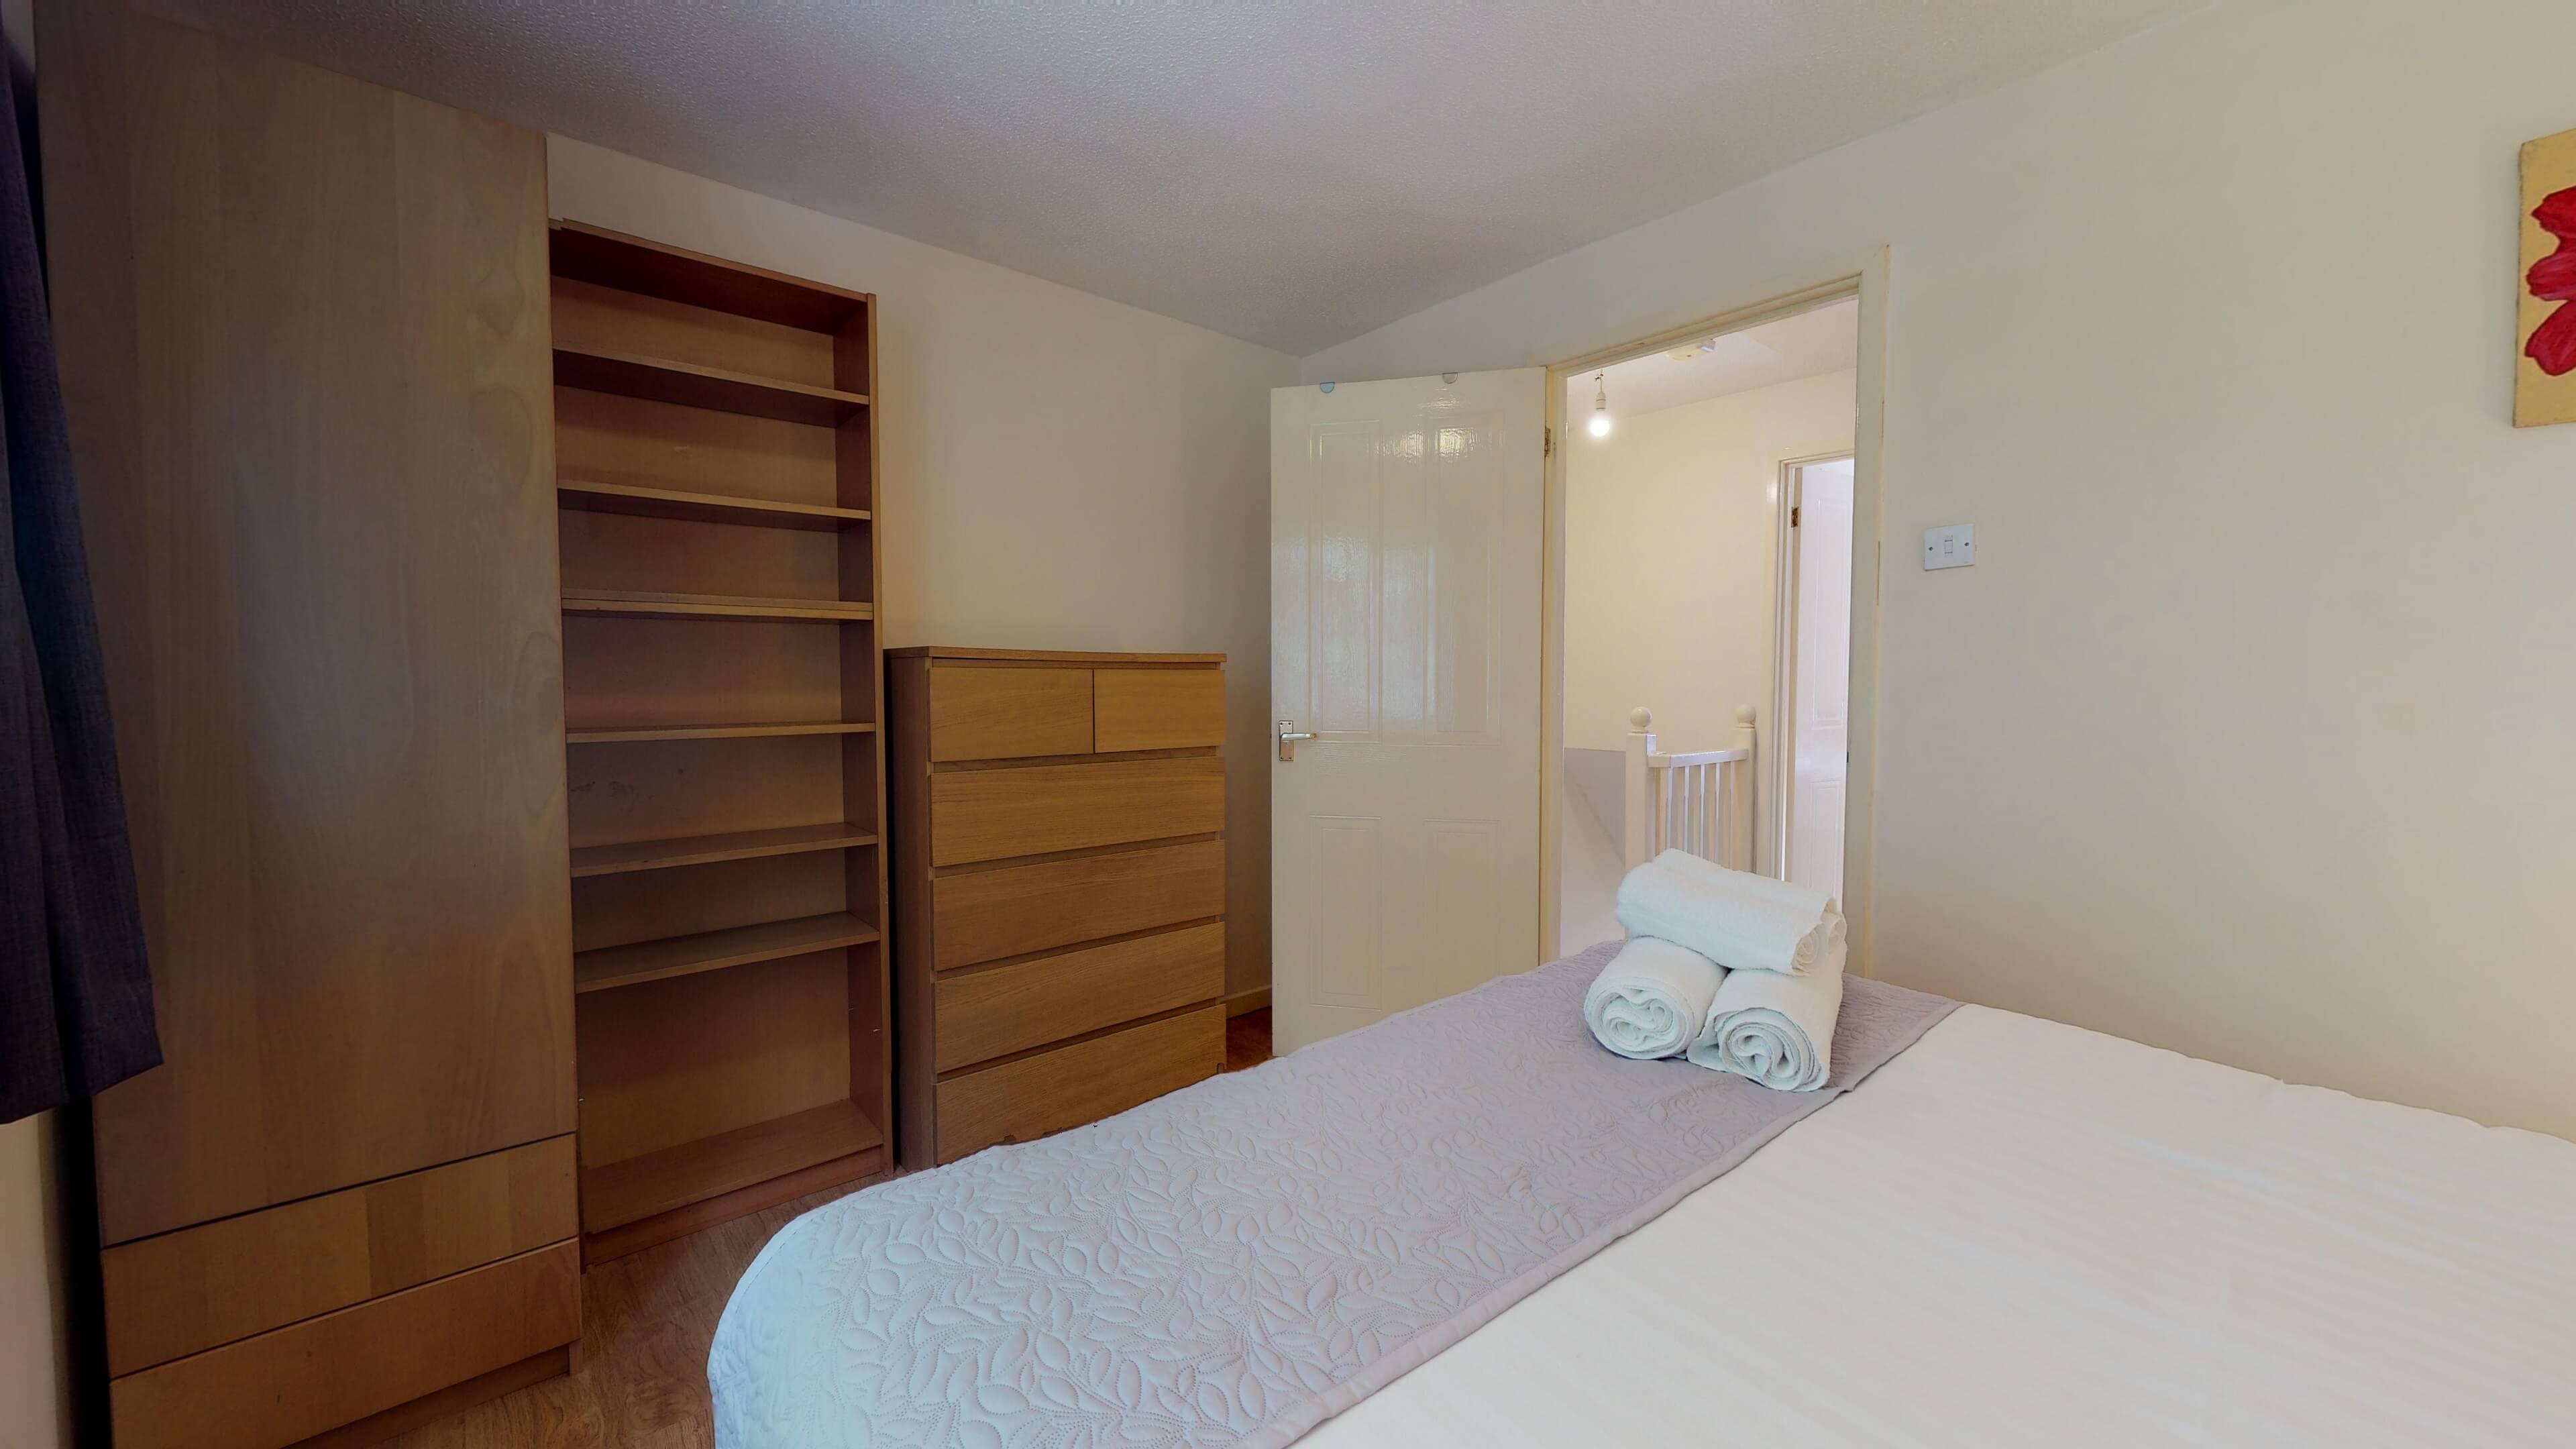 Anne Greenwood Bedroom 1